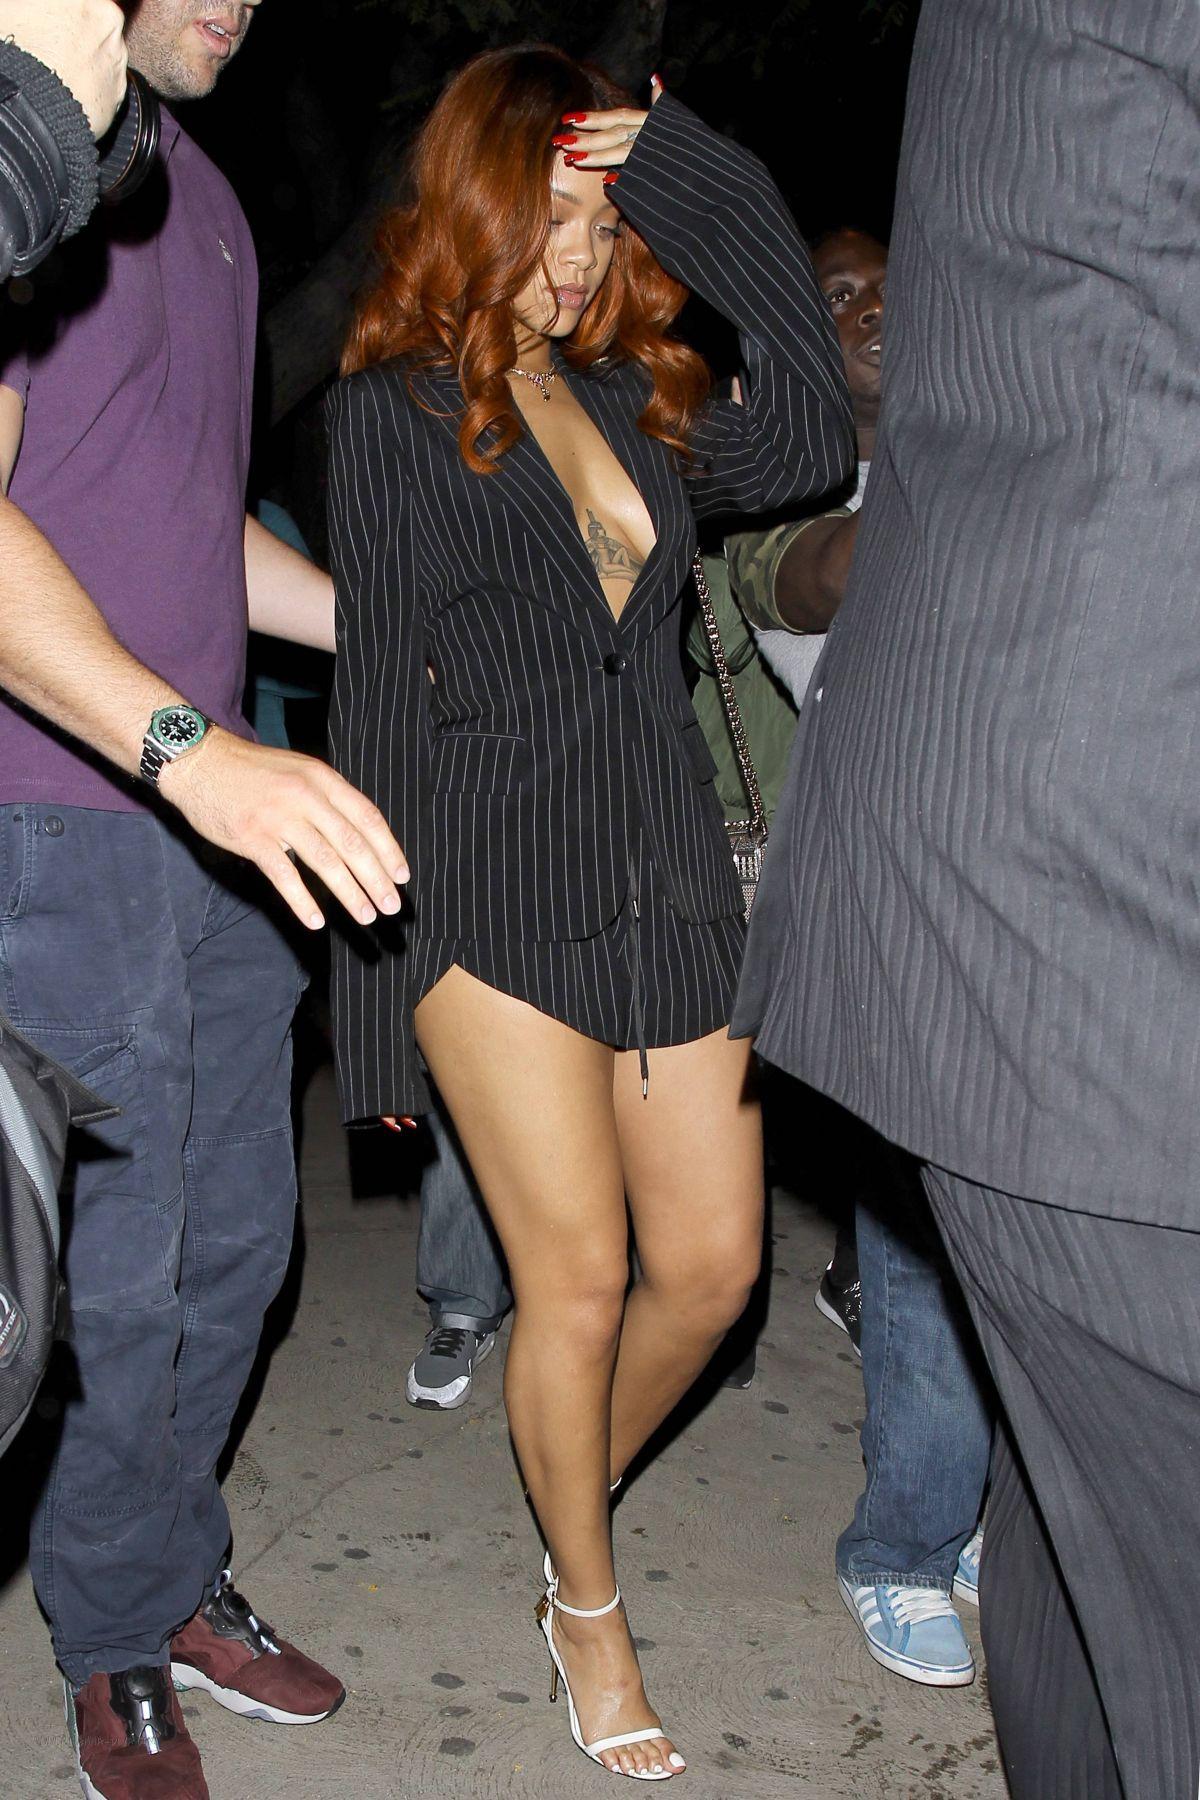 Bikini Sideboobs Rihanna naked photo 2017